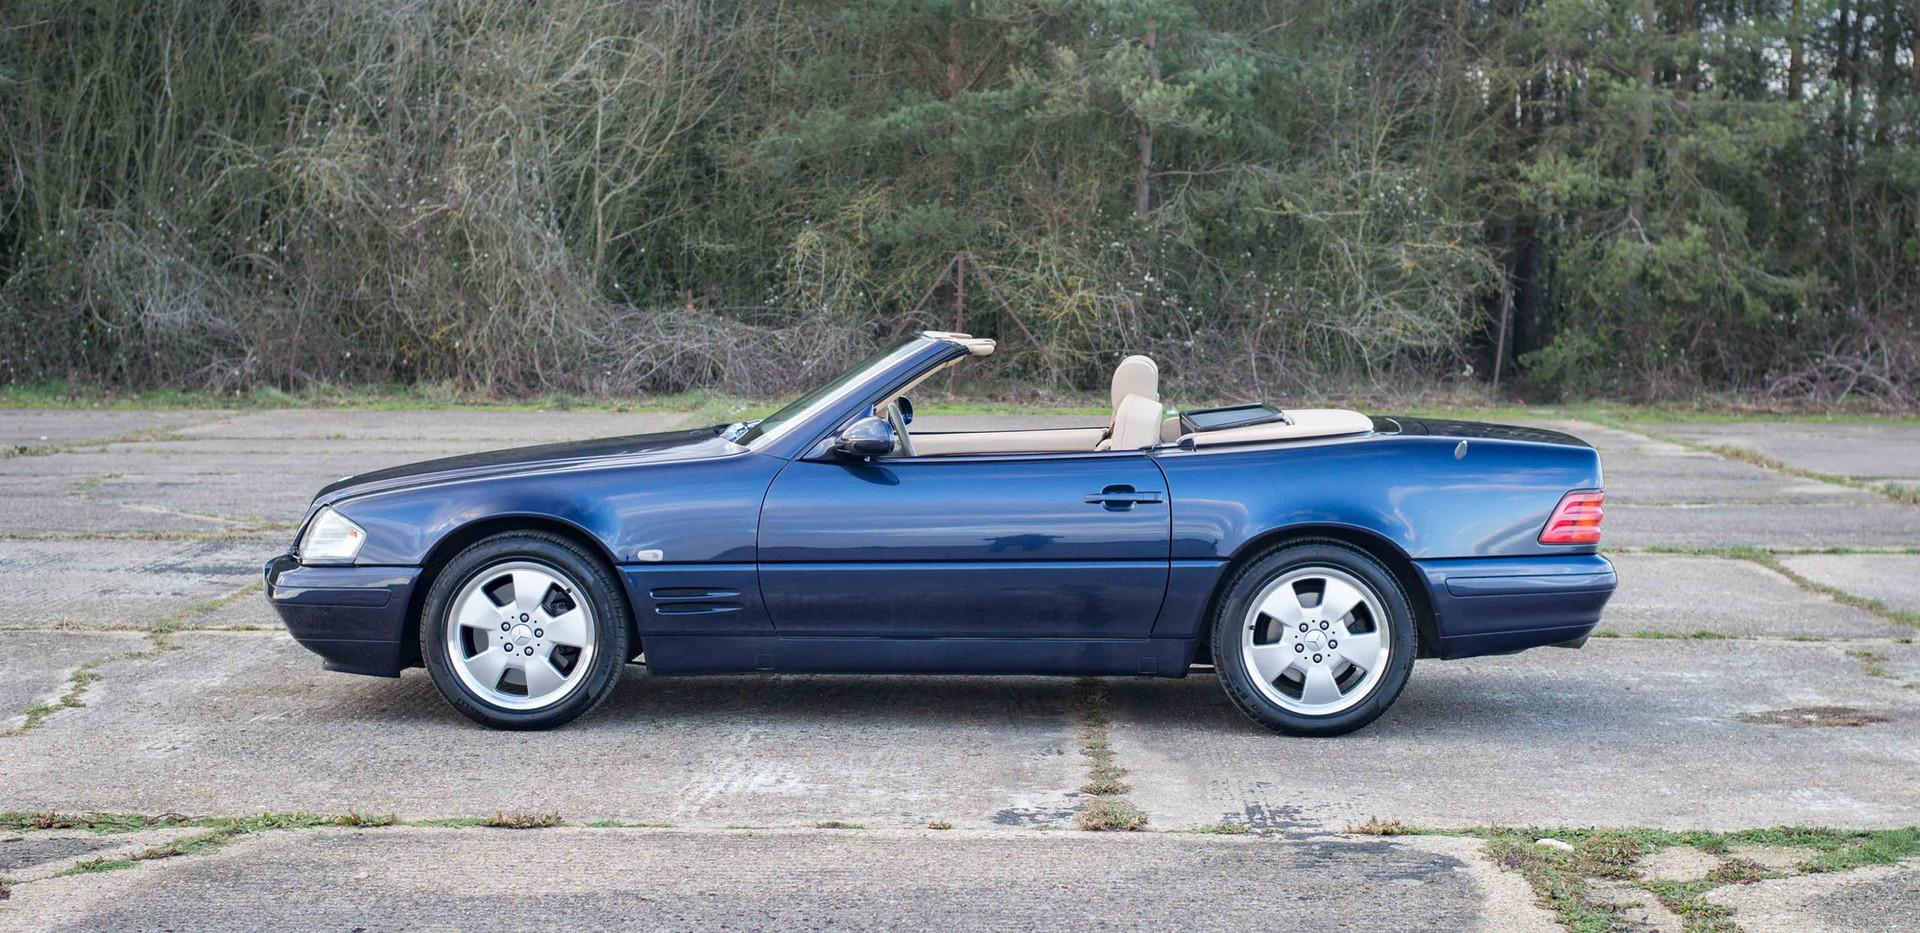 SL500 For Sale UK London  (11 of 36).jpg